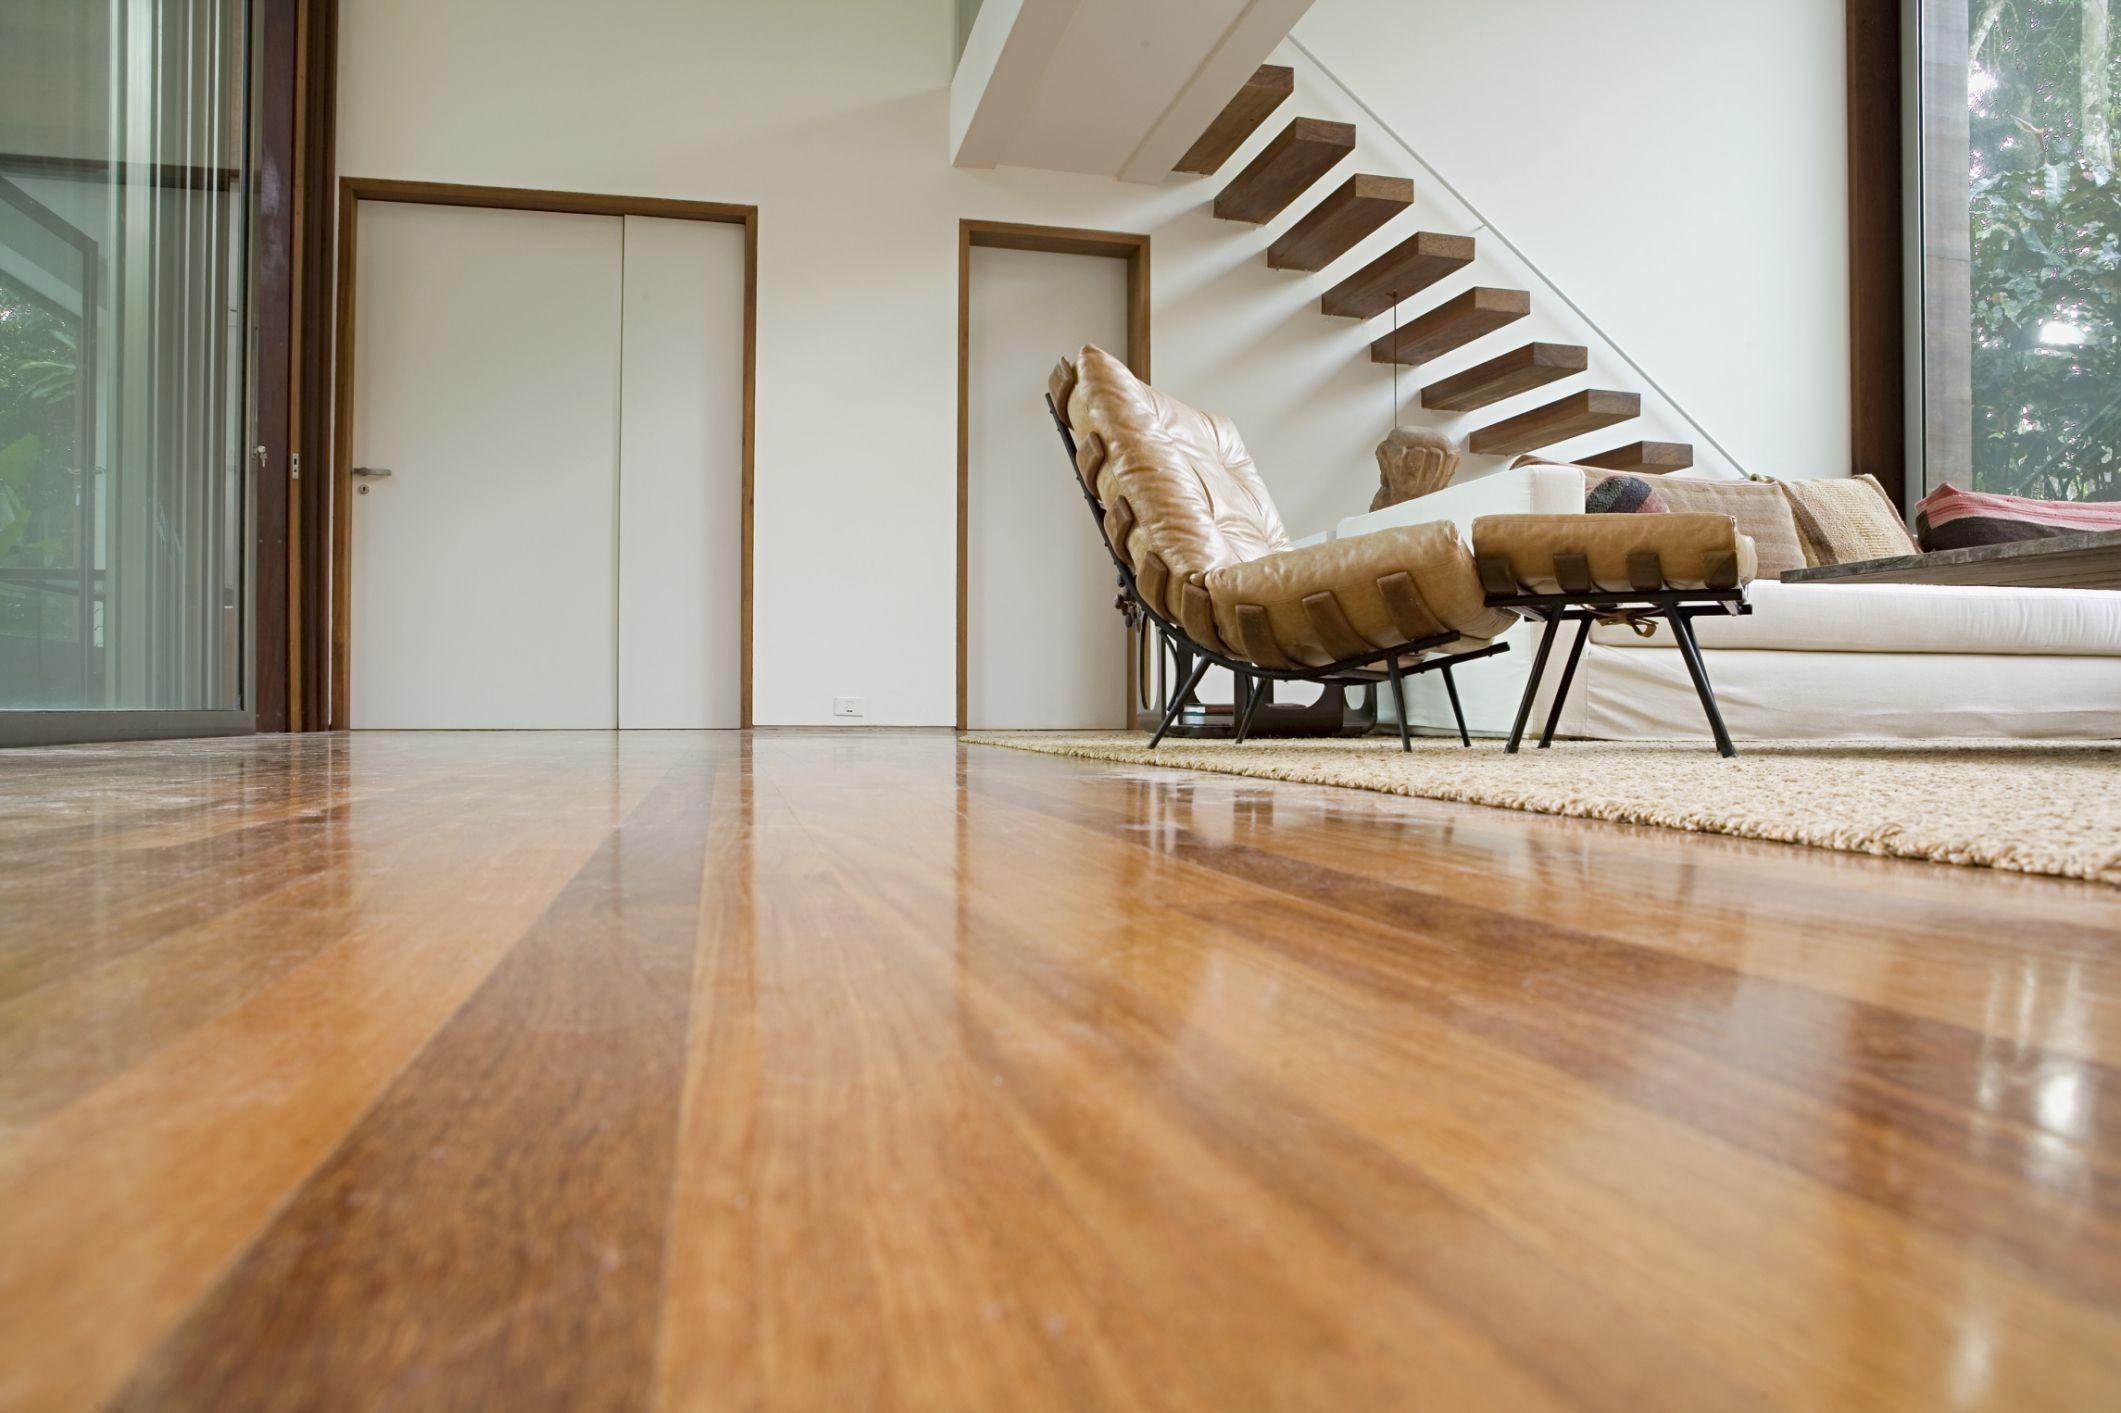 bruce locking engineered hardwood flooring of engineered wood flooring vs solid wood flooring pertaining to 200571260 001 highres 56a49dec5f9b58b7d0d7dc1e